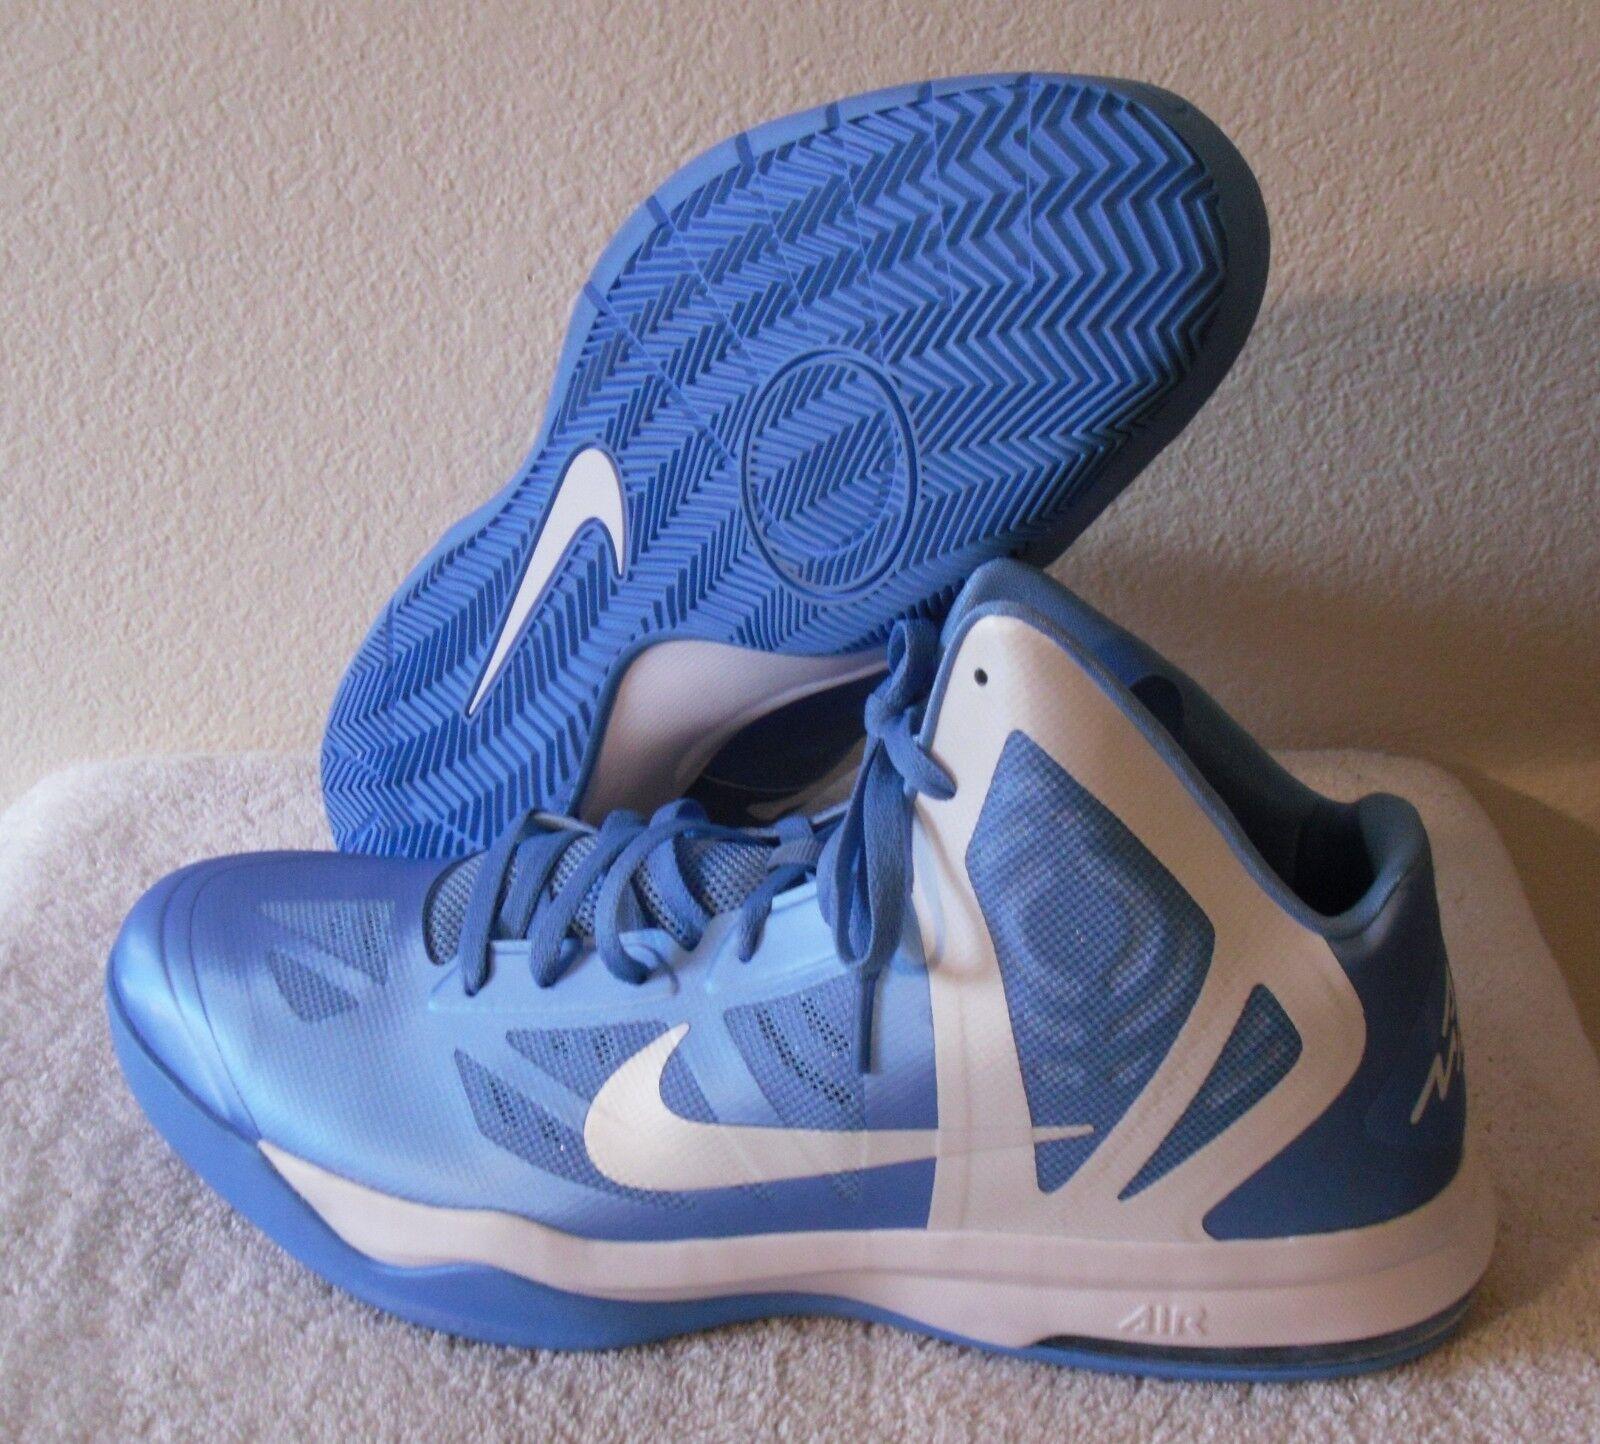 NEW Nike Air Max Hyper Aggressor TB Mens Basketball shoes 17.5 bluee White  110